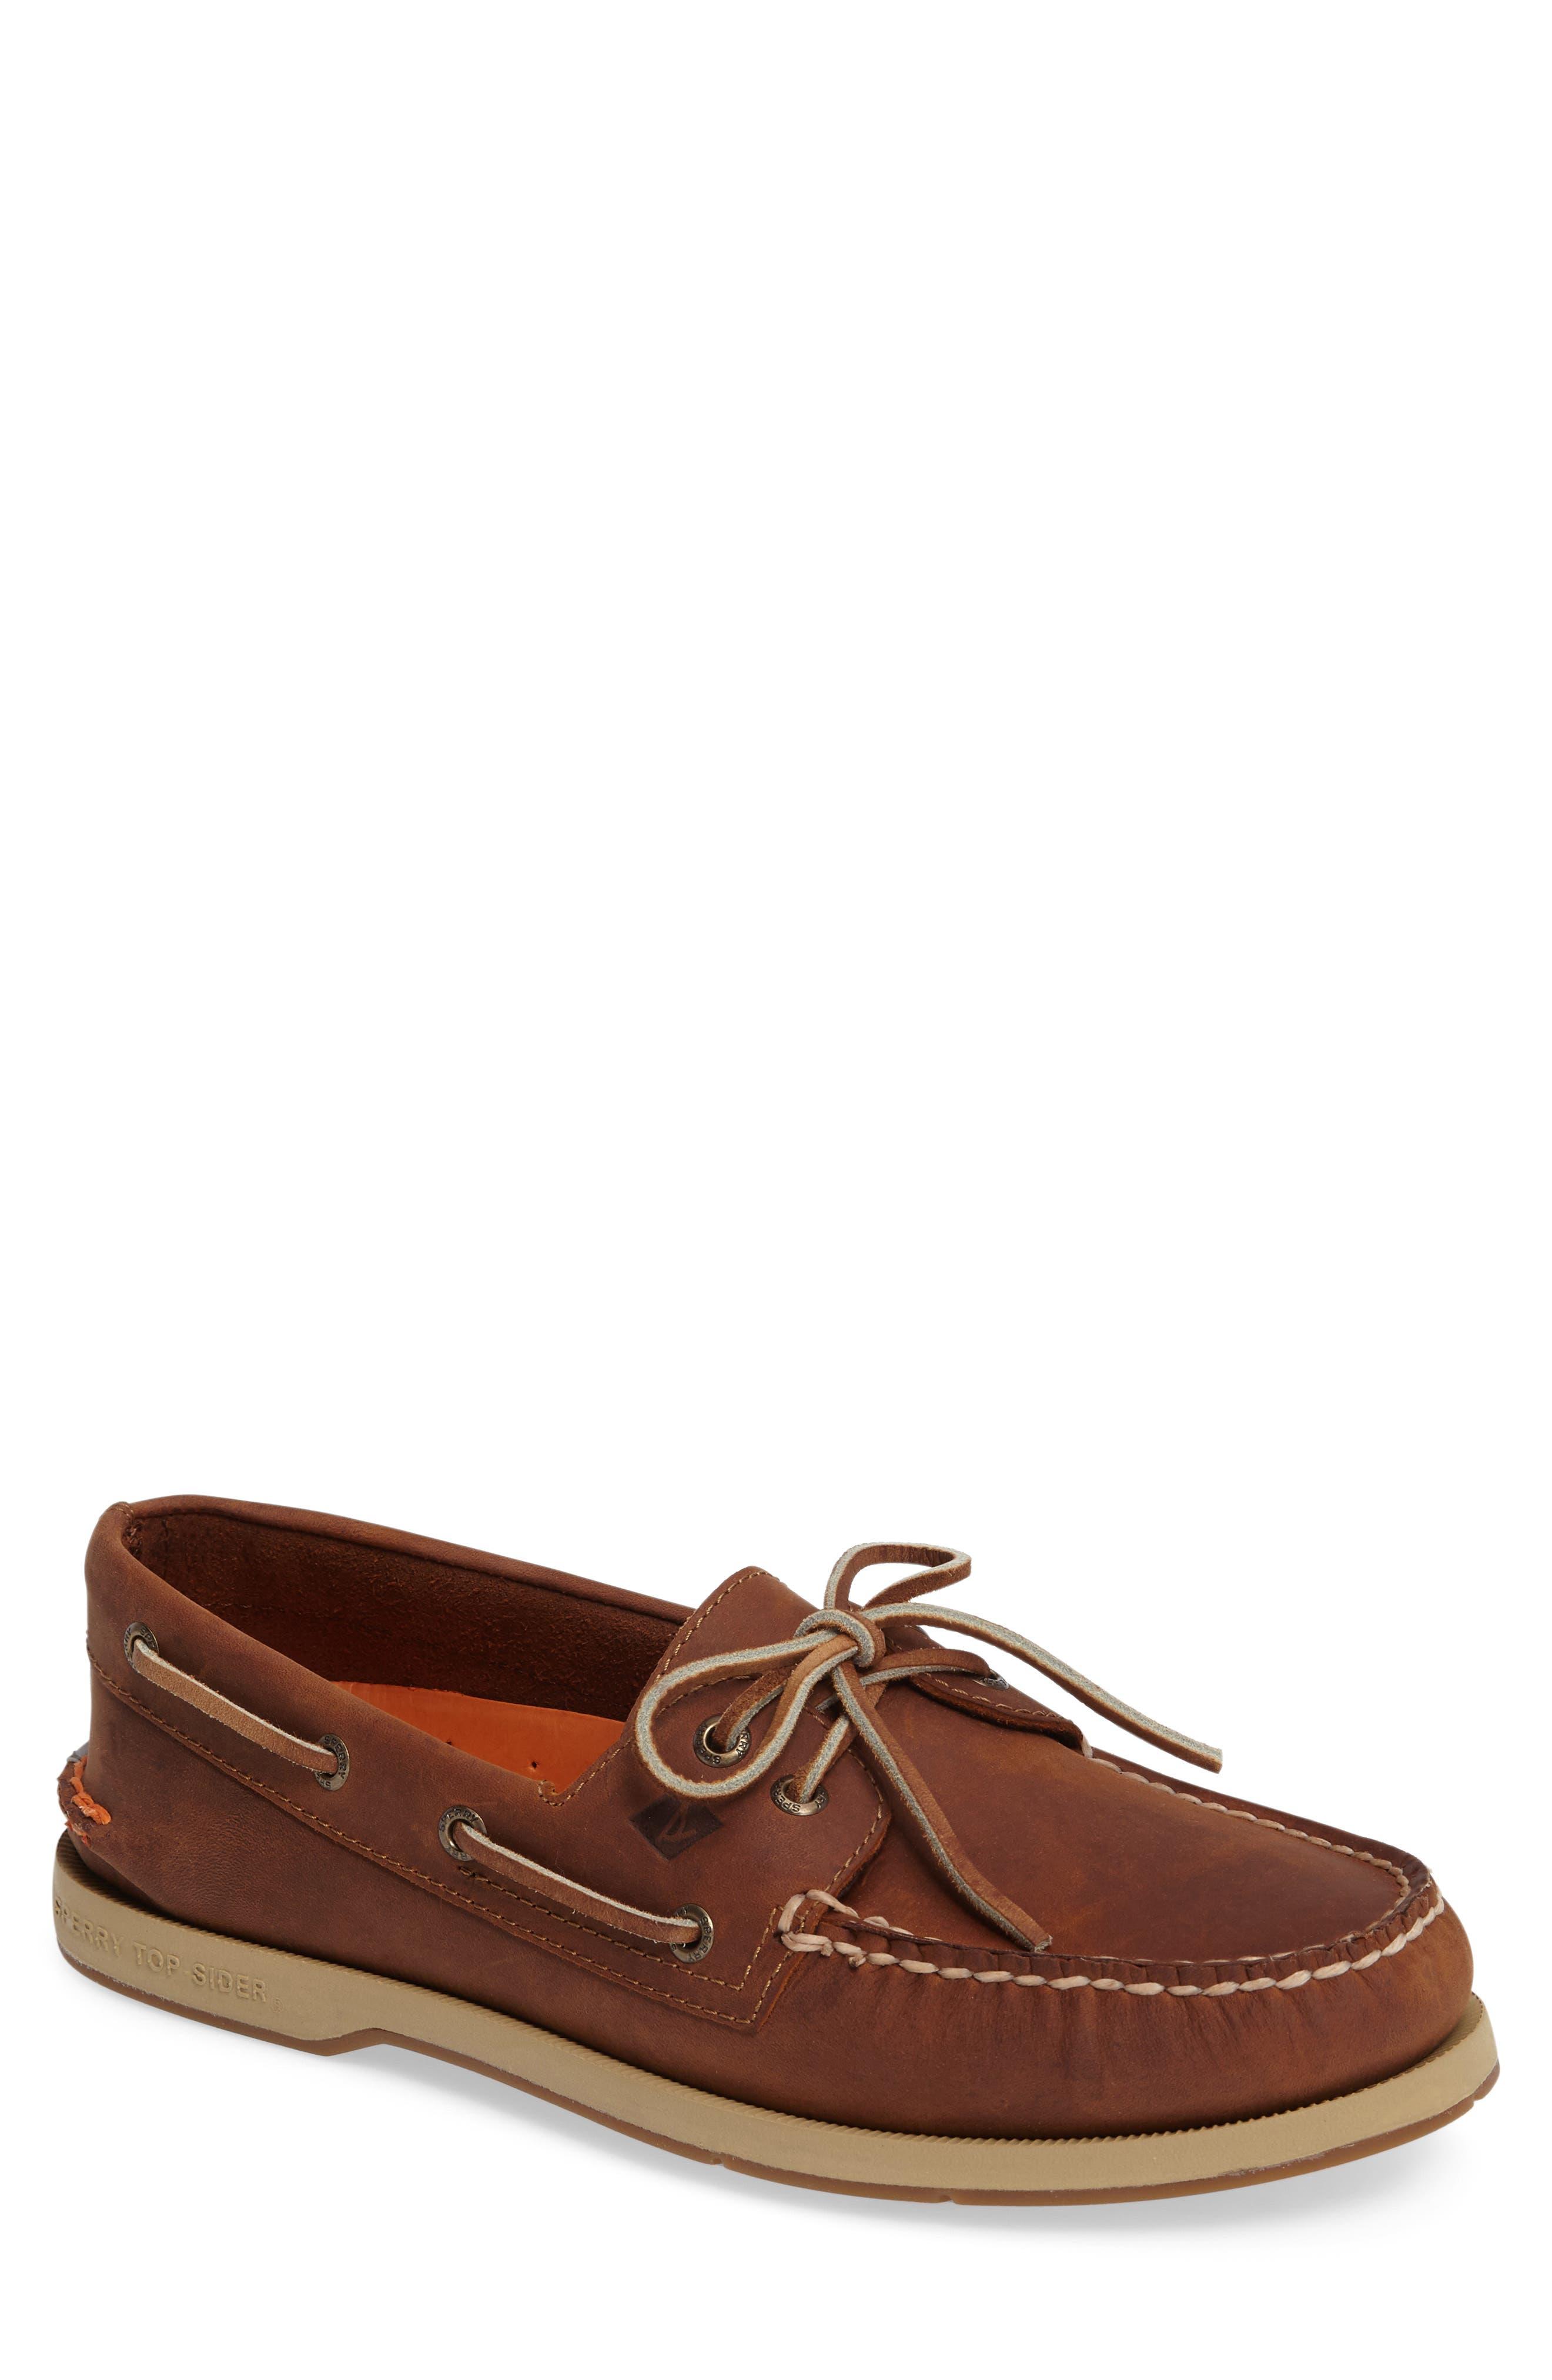 Alternate Image 1 Selected - Sperry Captain's Authentic Original Boat Shoe (Men)